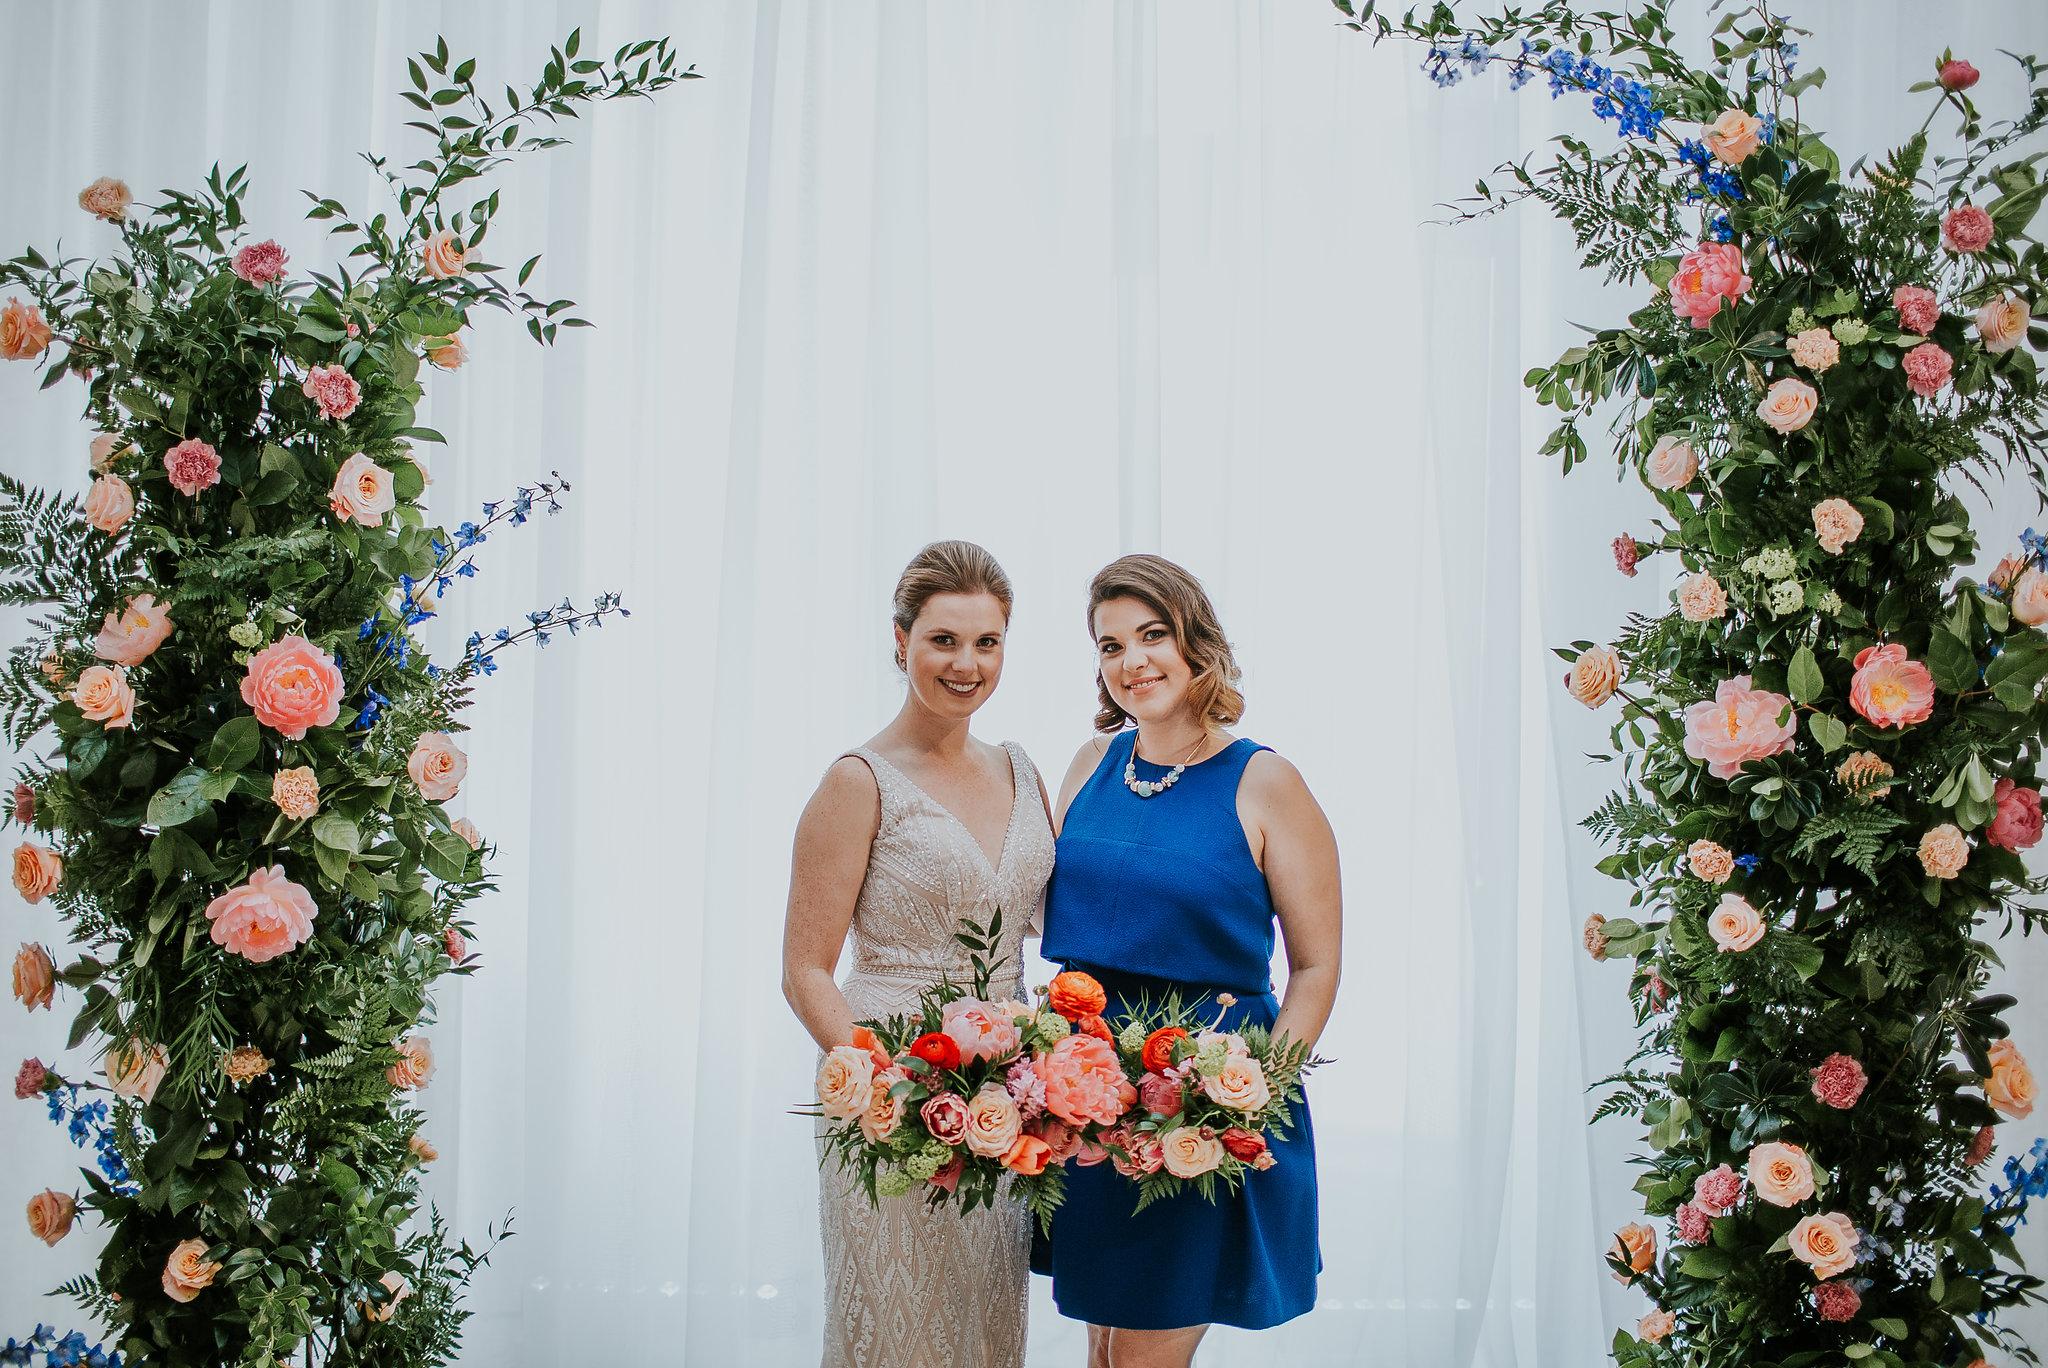 Coral and Blue Wedding Flowers - Winnipeg Wedding Florists